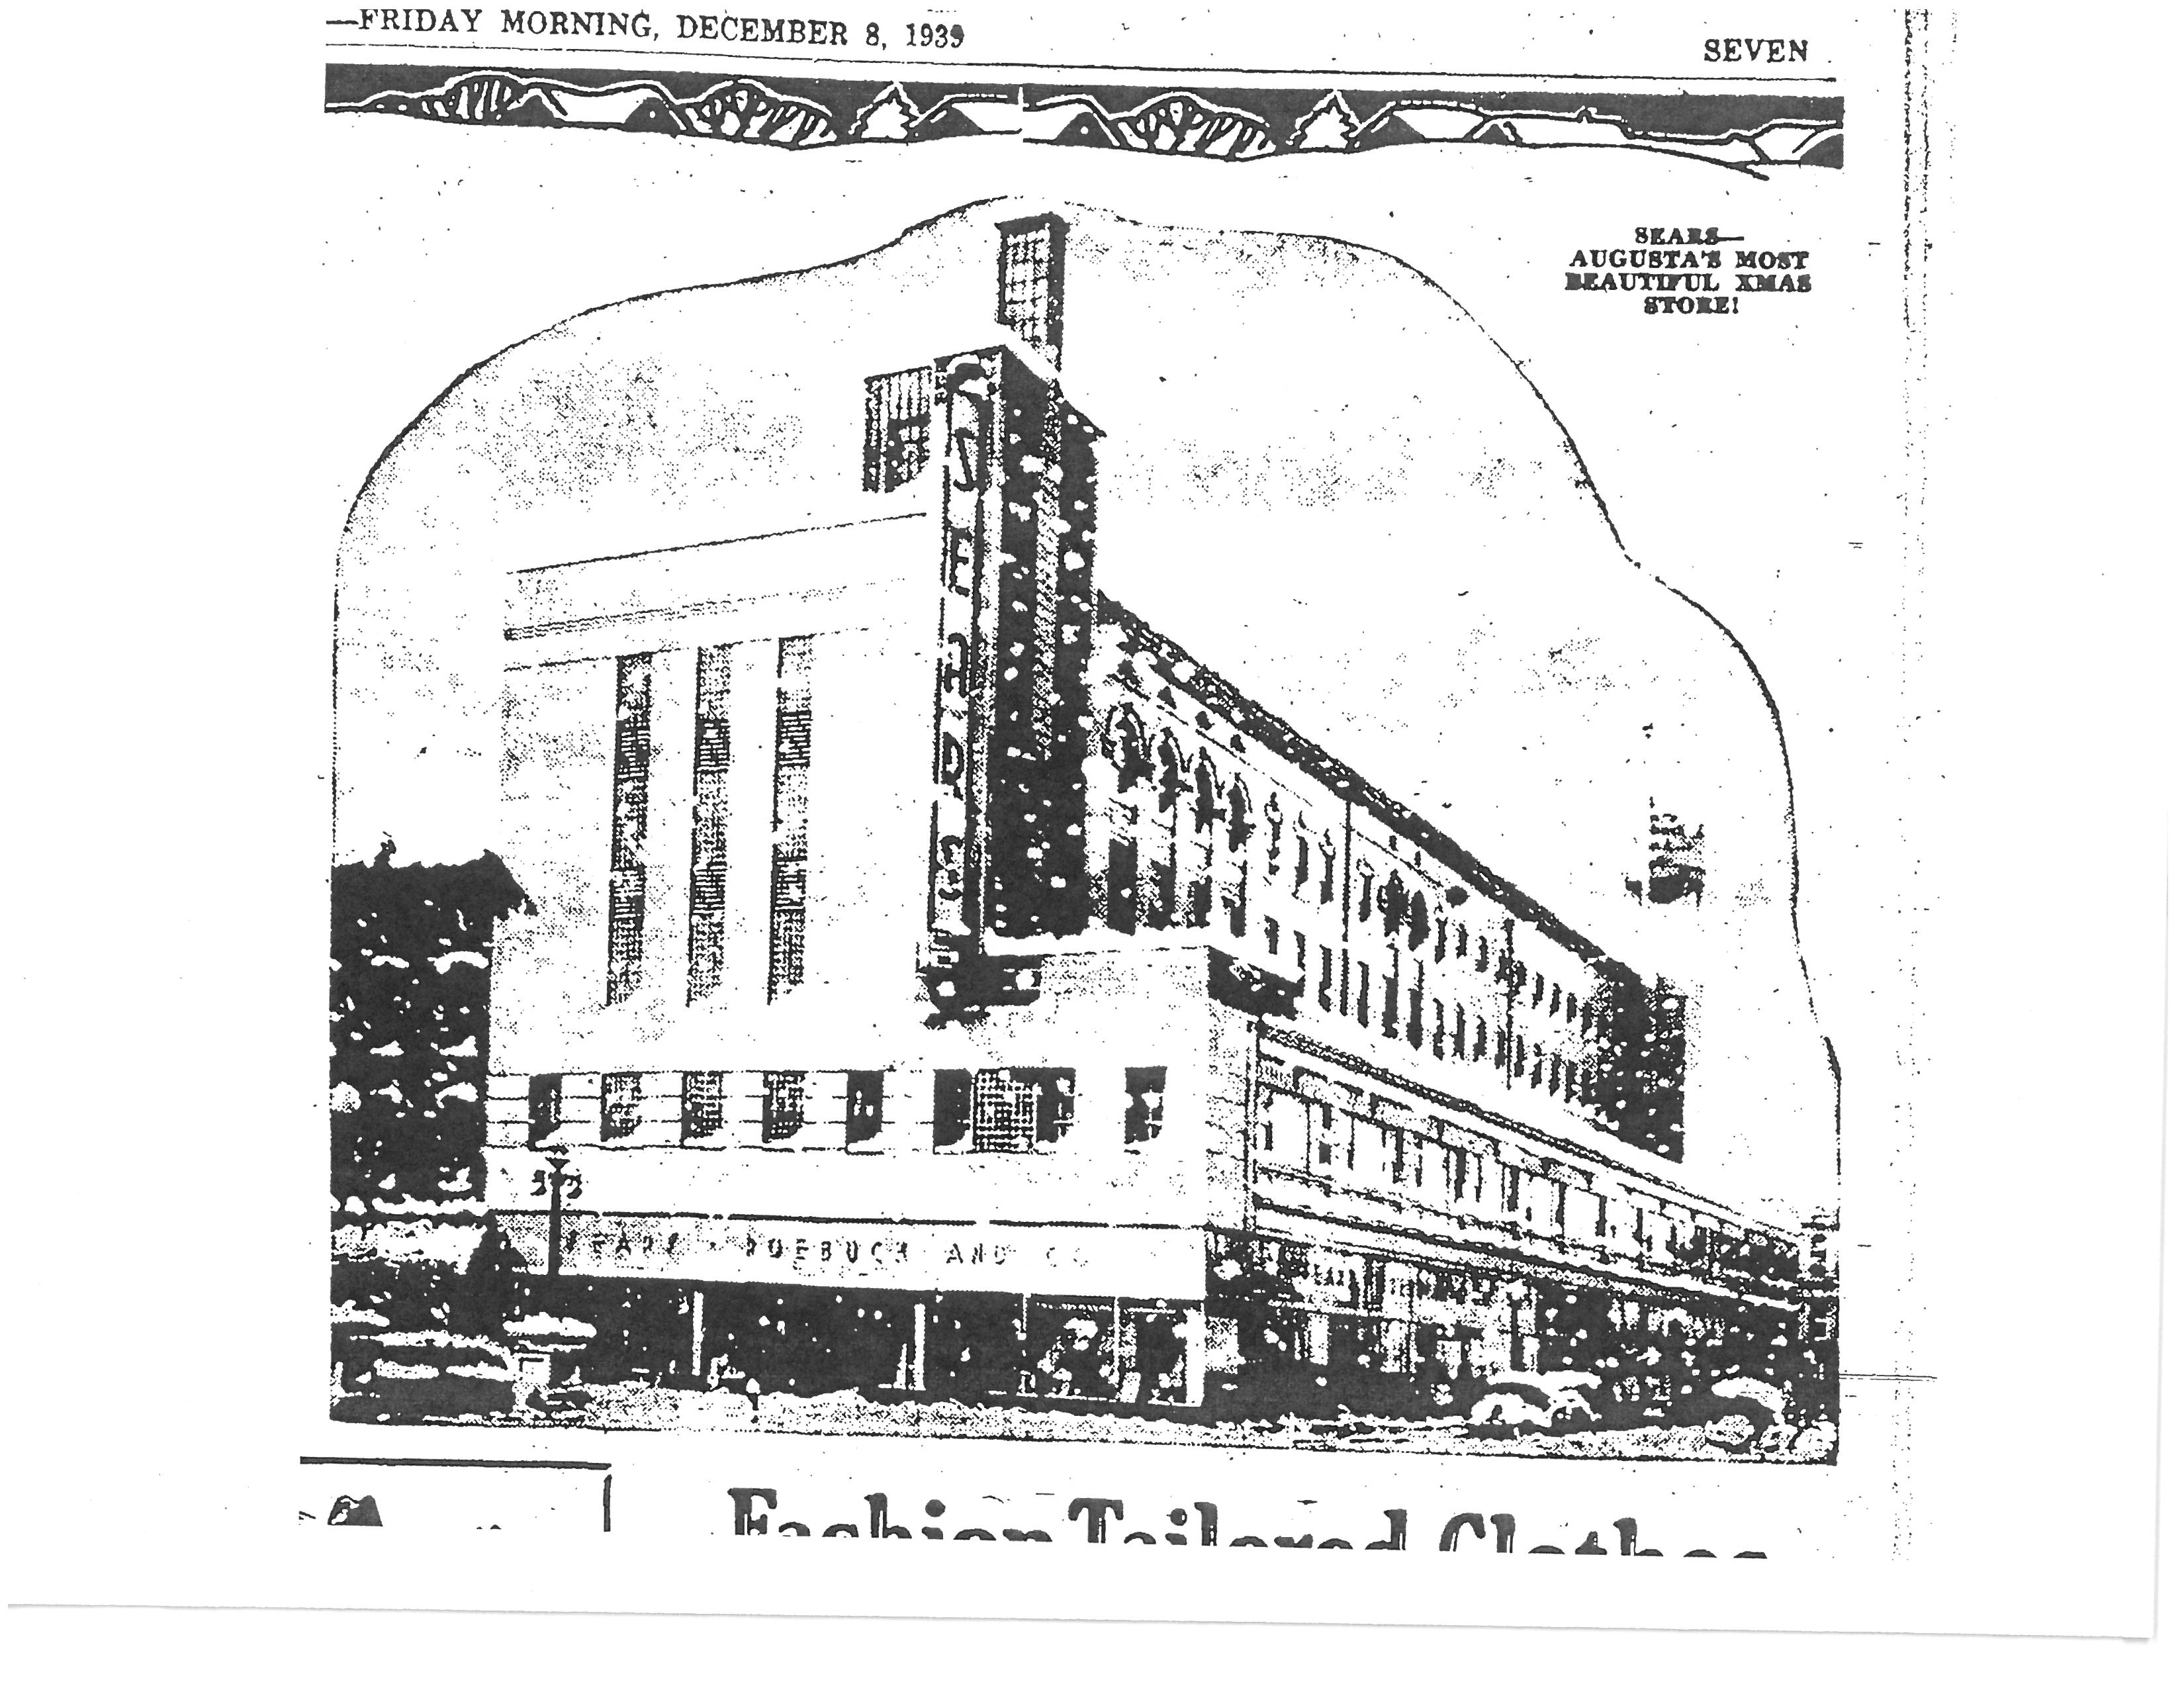 Sears Roebuck 1939